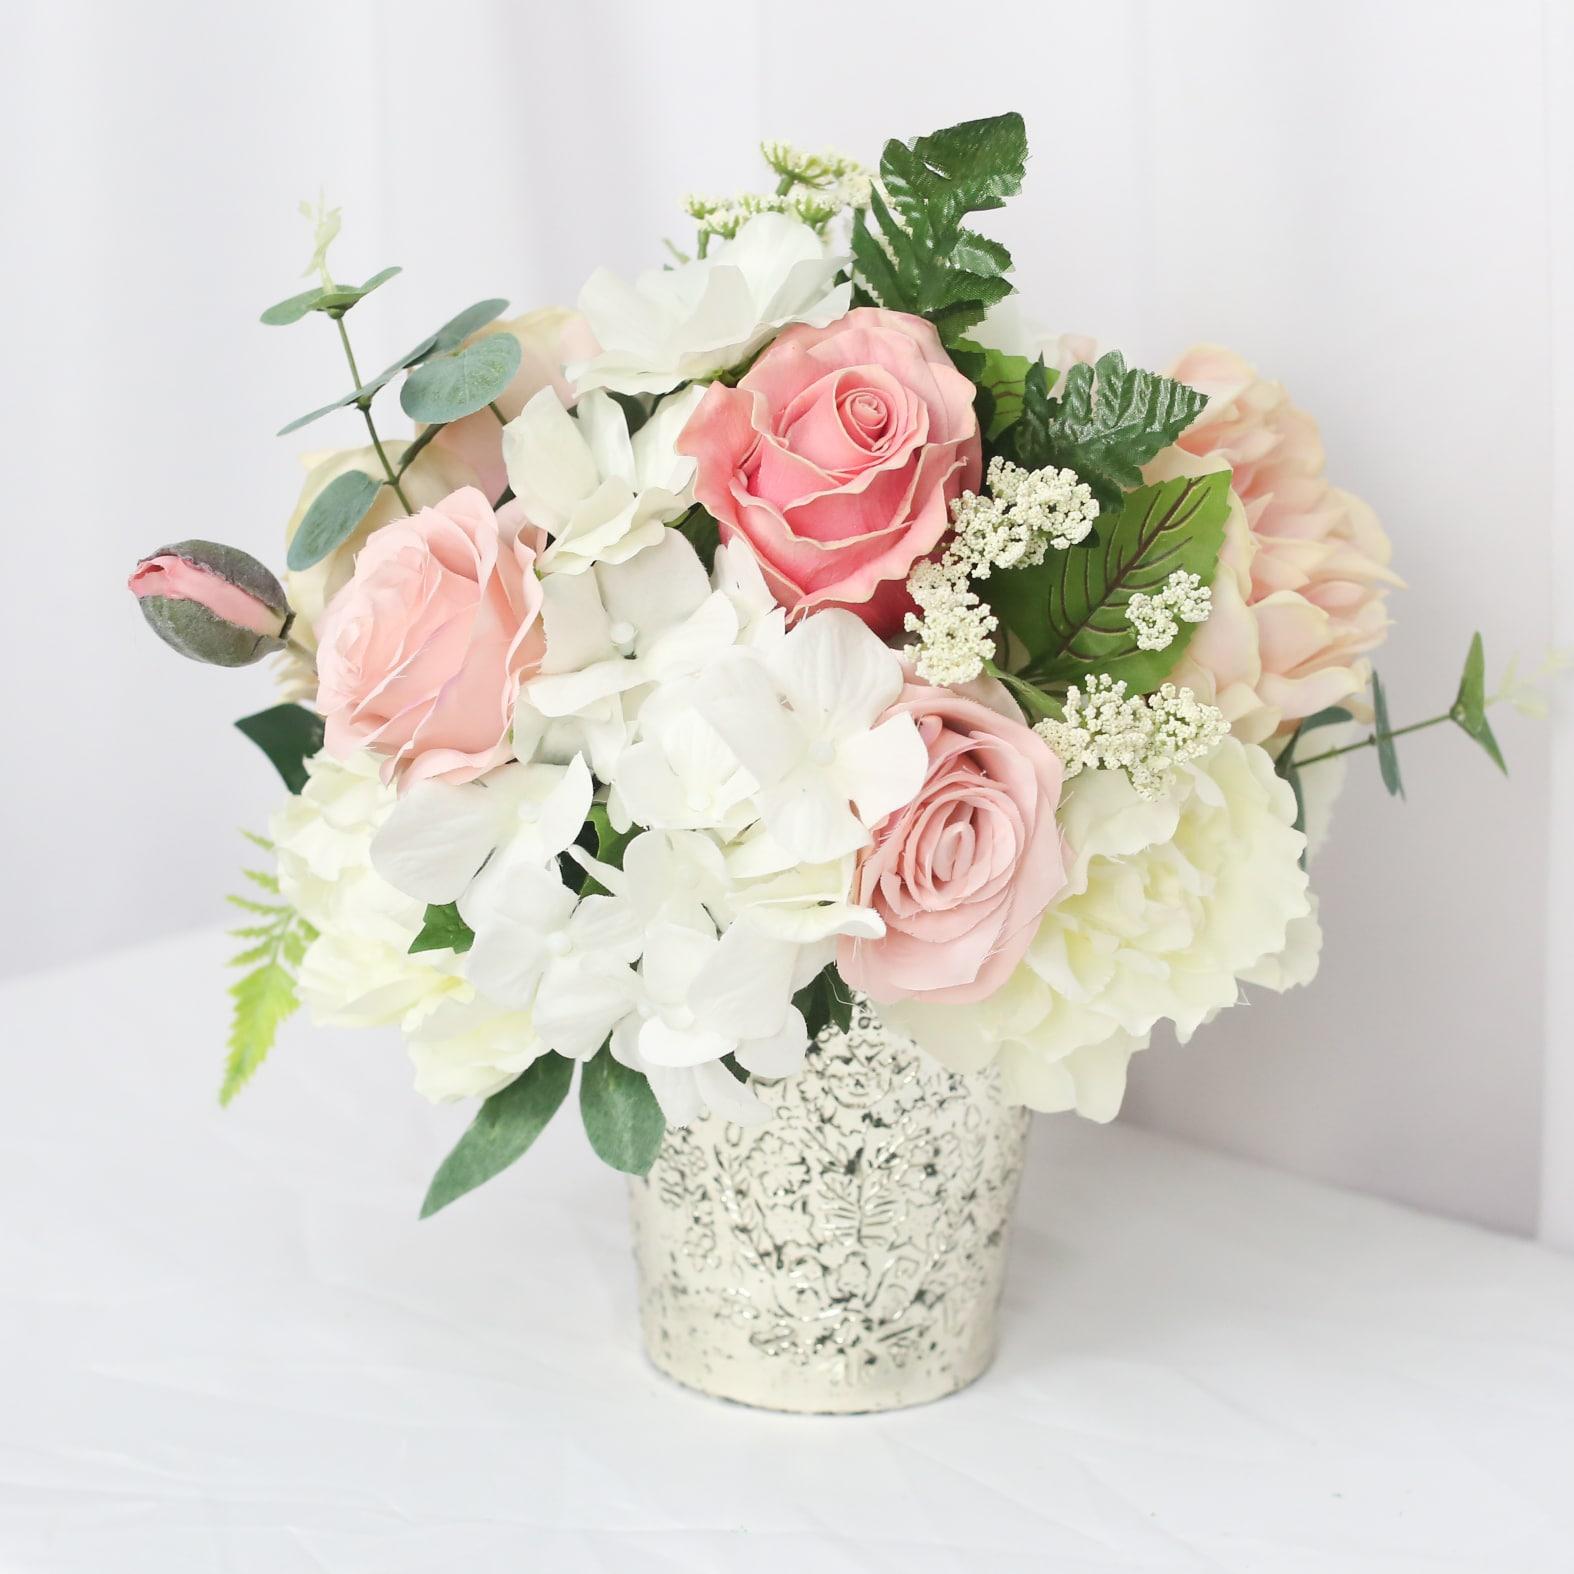 FloralBash, florist near Caledon